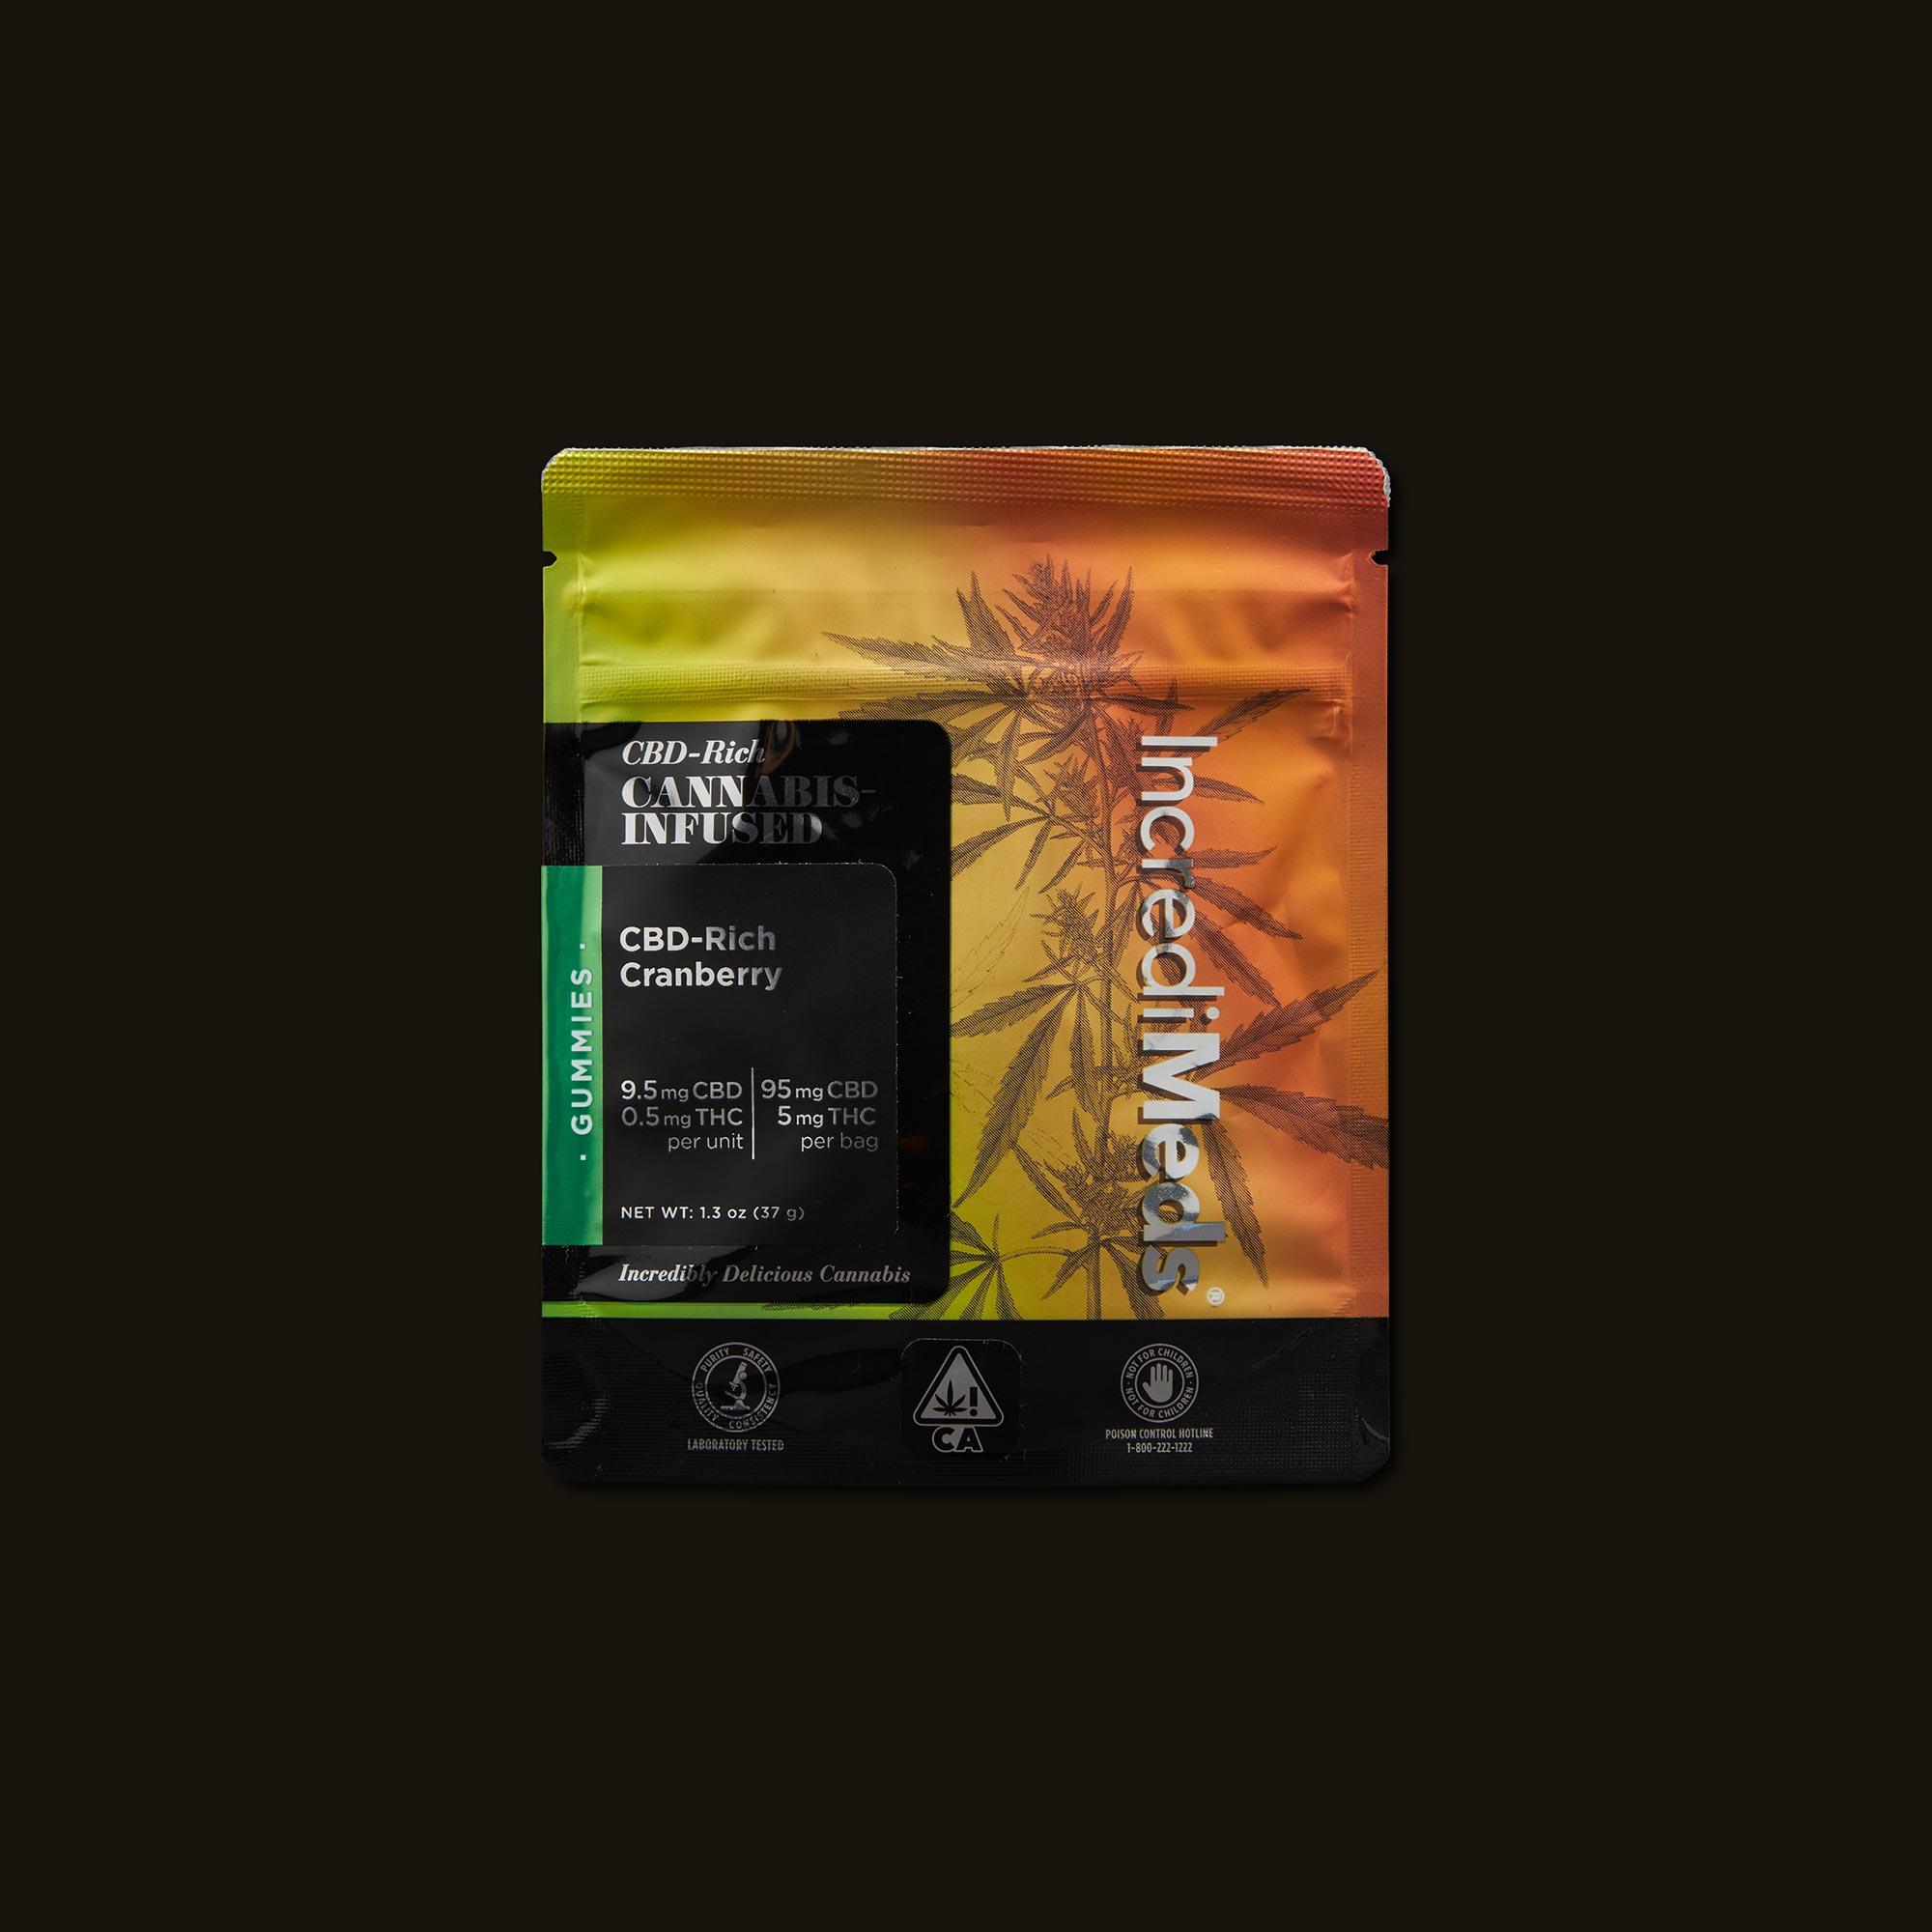 IncrediMeds CBD-Rich Cranberry Gummies Front Packaging